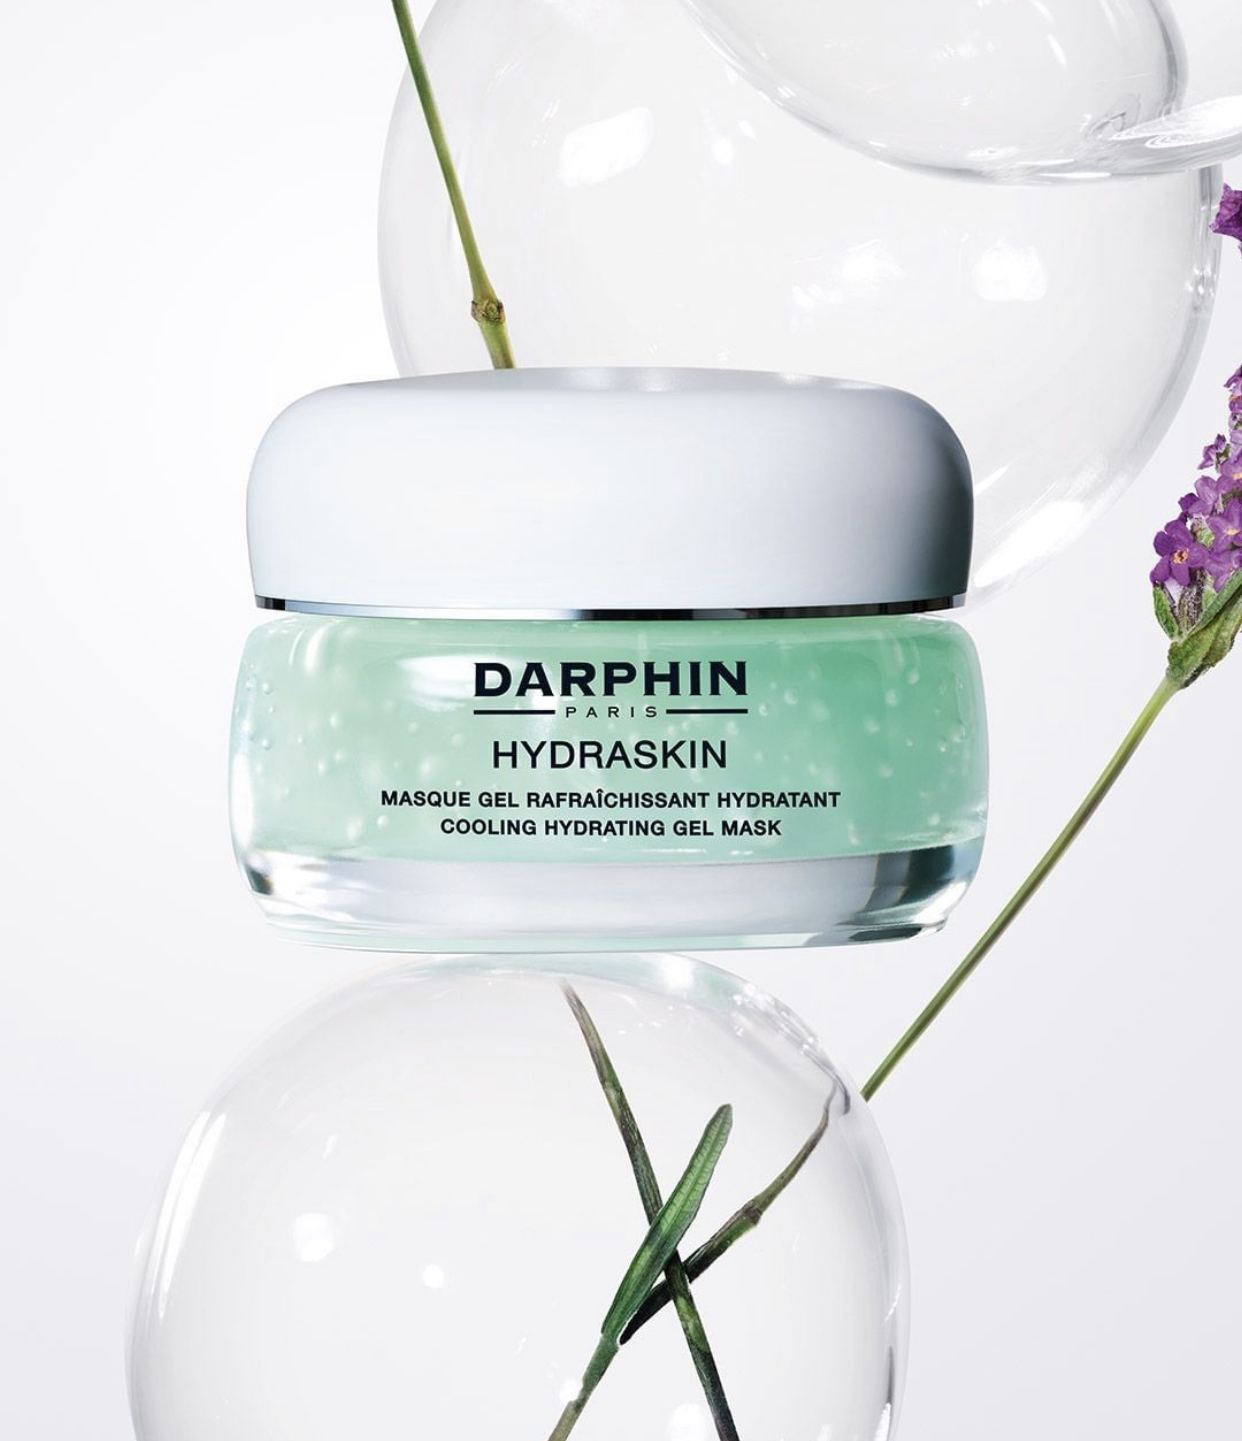 Darphin HydraSkin Cooling Hydrating Gel Mask